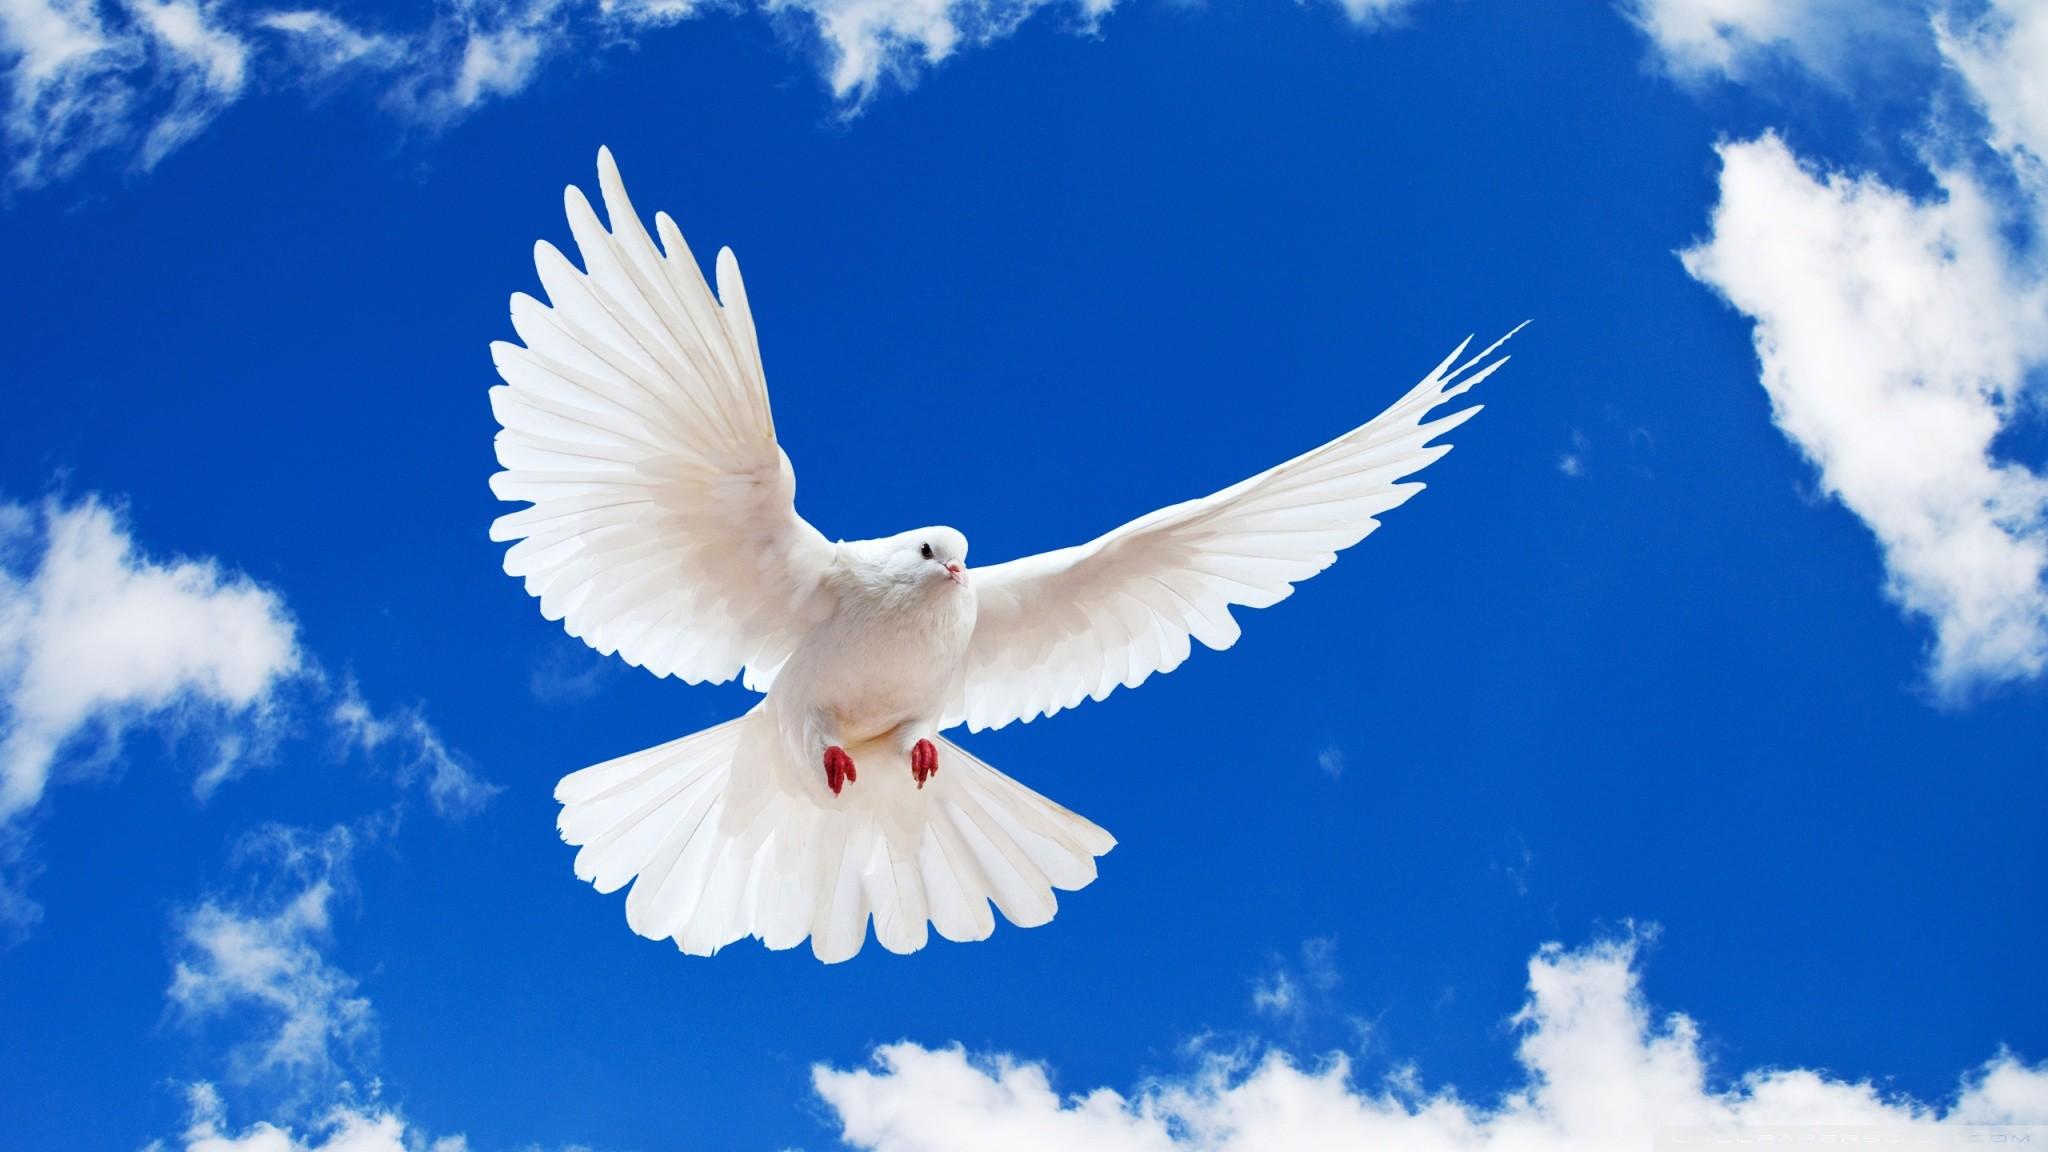 Holy Spirit Backgrounds 44 Images